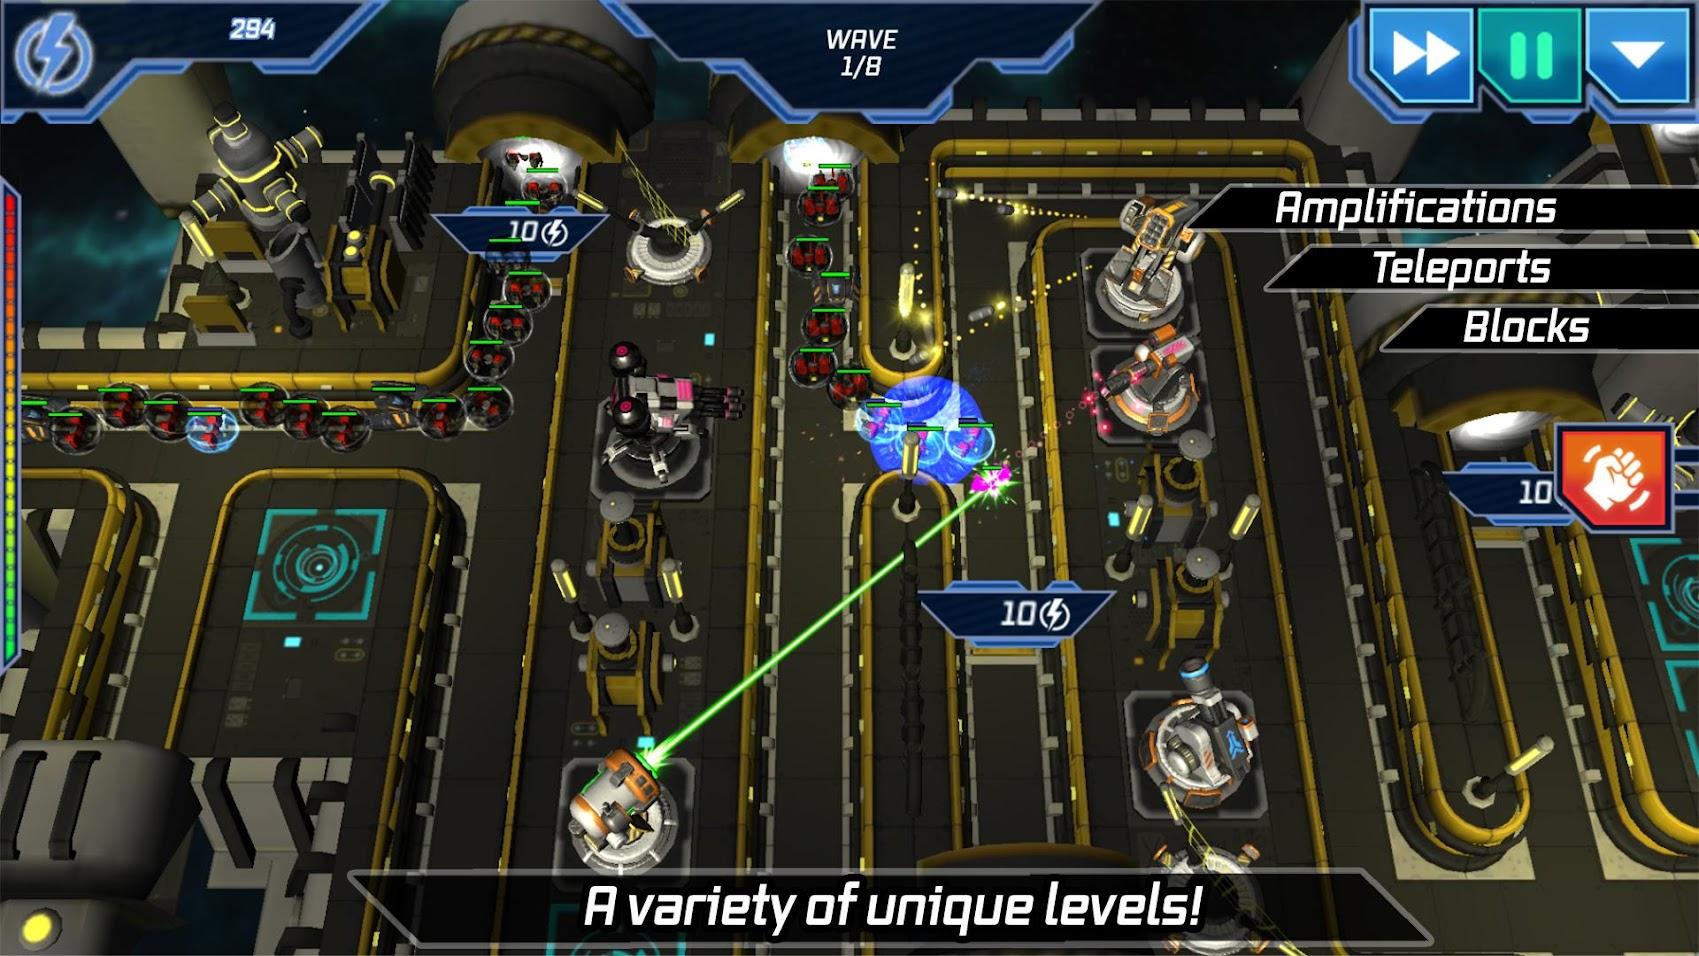 Hack Game Sci Fi Tower Defense. Module Td V1.70 Mod | Full Money OFEIWNOYJTxtySwLDs_tyiMvII06RjVYaiCrcaMFe4DJBnZFVACglxDoPuSlCGN0Bw=w1699-h966